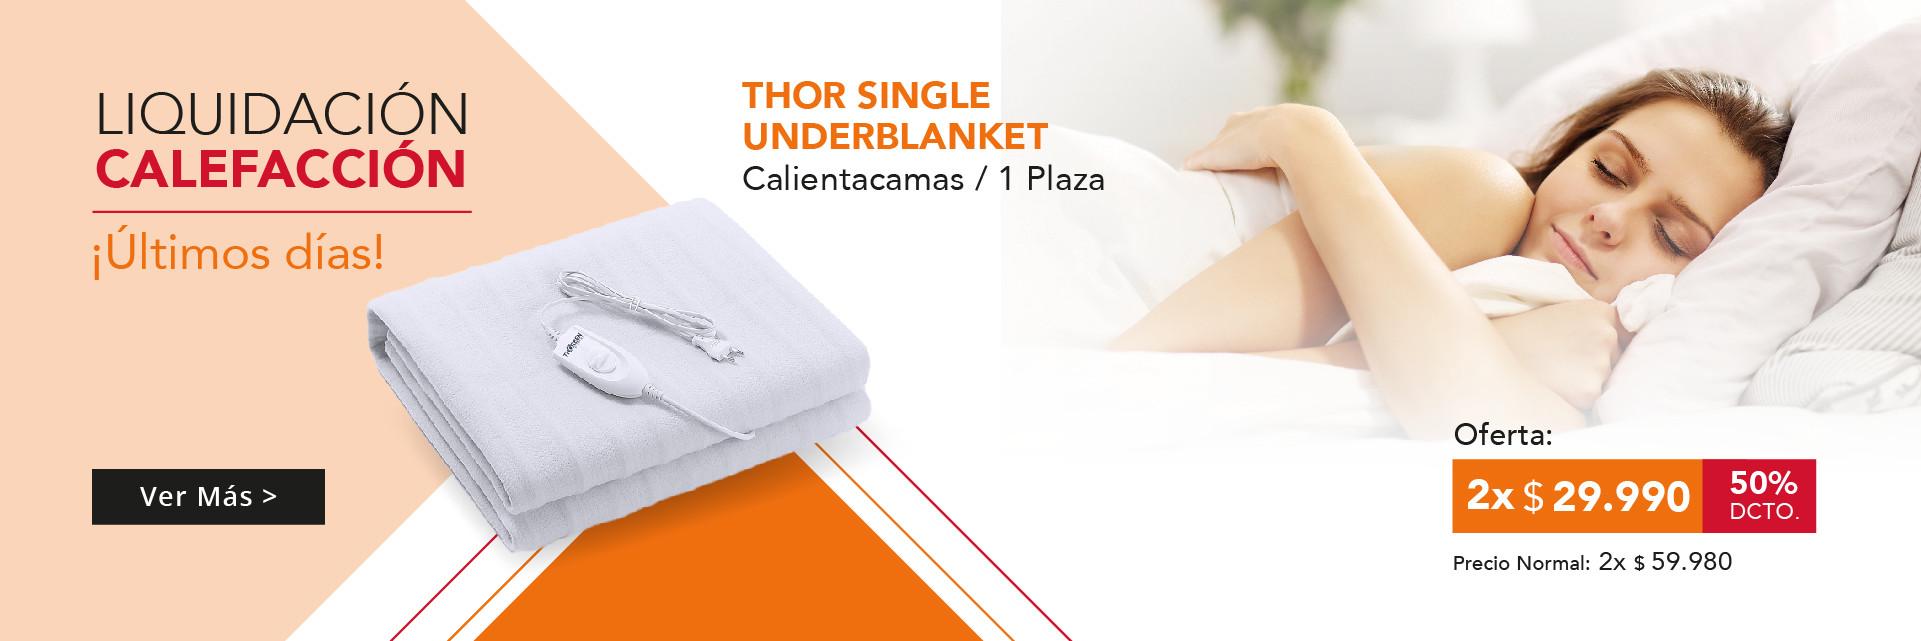 Calientacamas Thor Single Underblanket